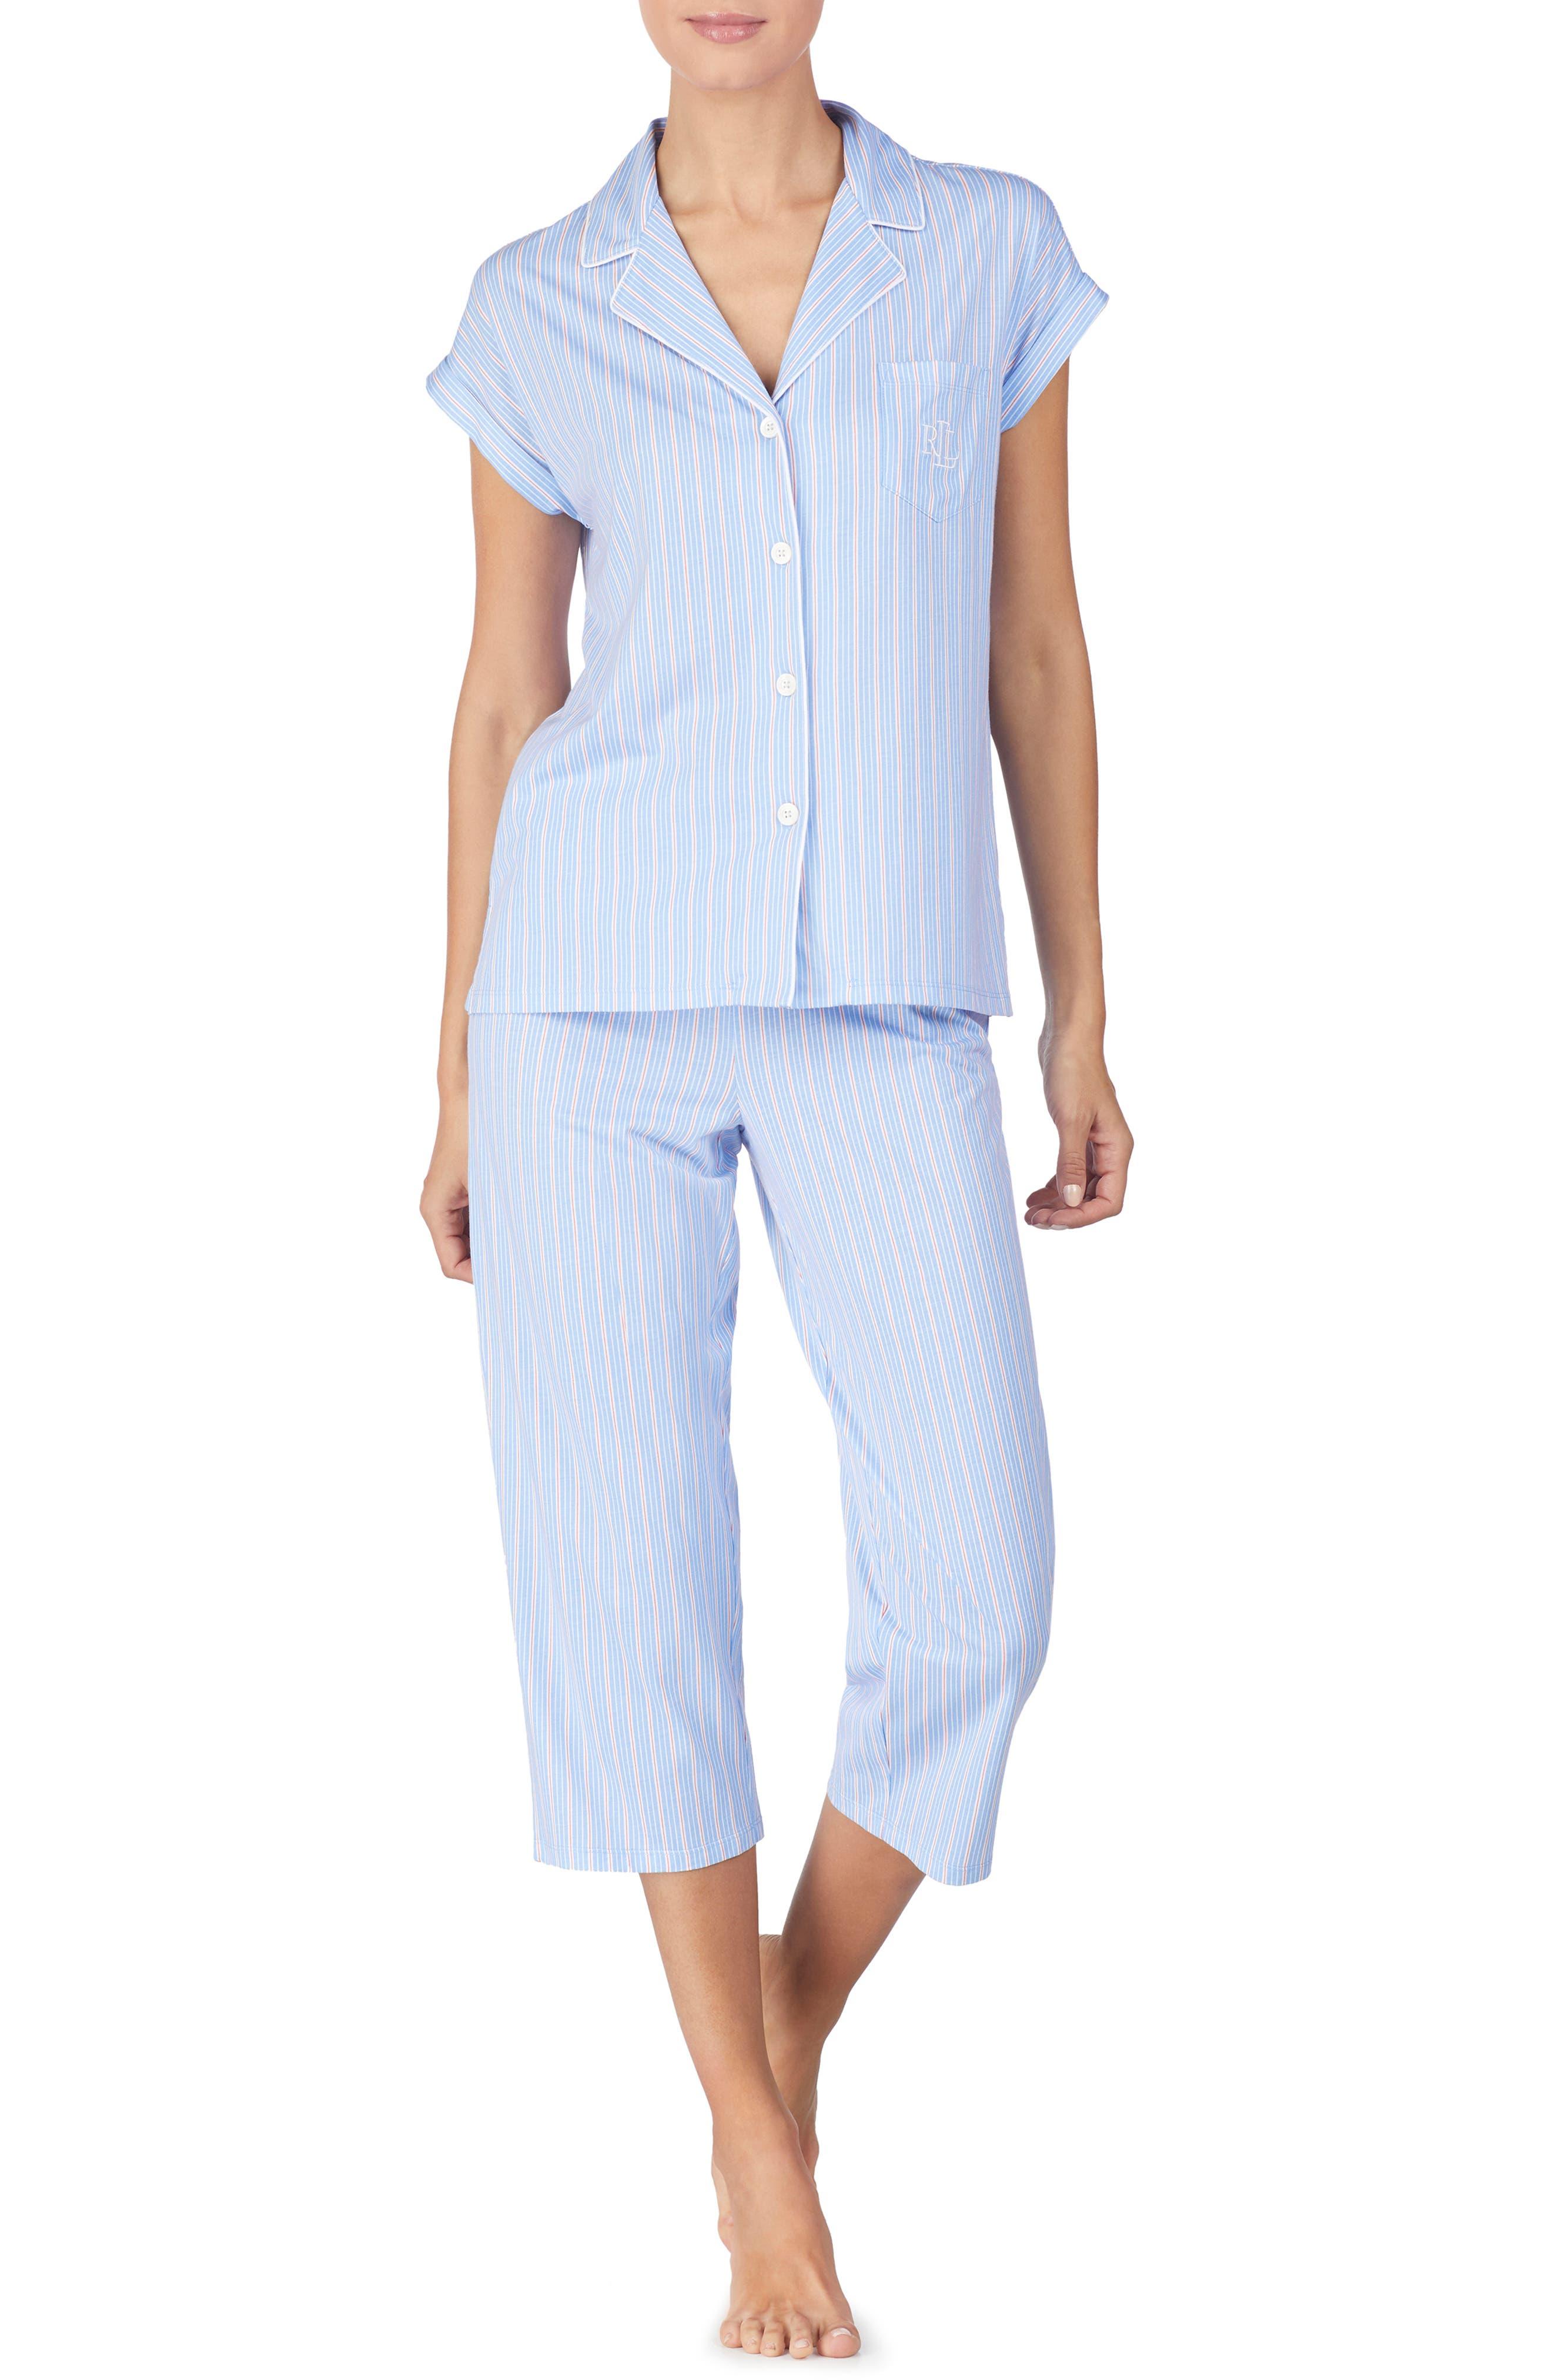 LAUREN RALPH LAUREN,                             Capri Pajamas,                             Main thumbnail 1, color,                             BLUE STRIPE